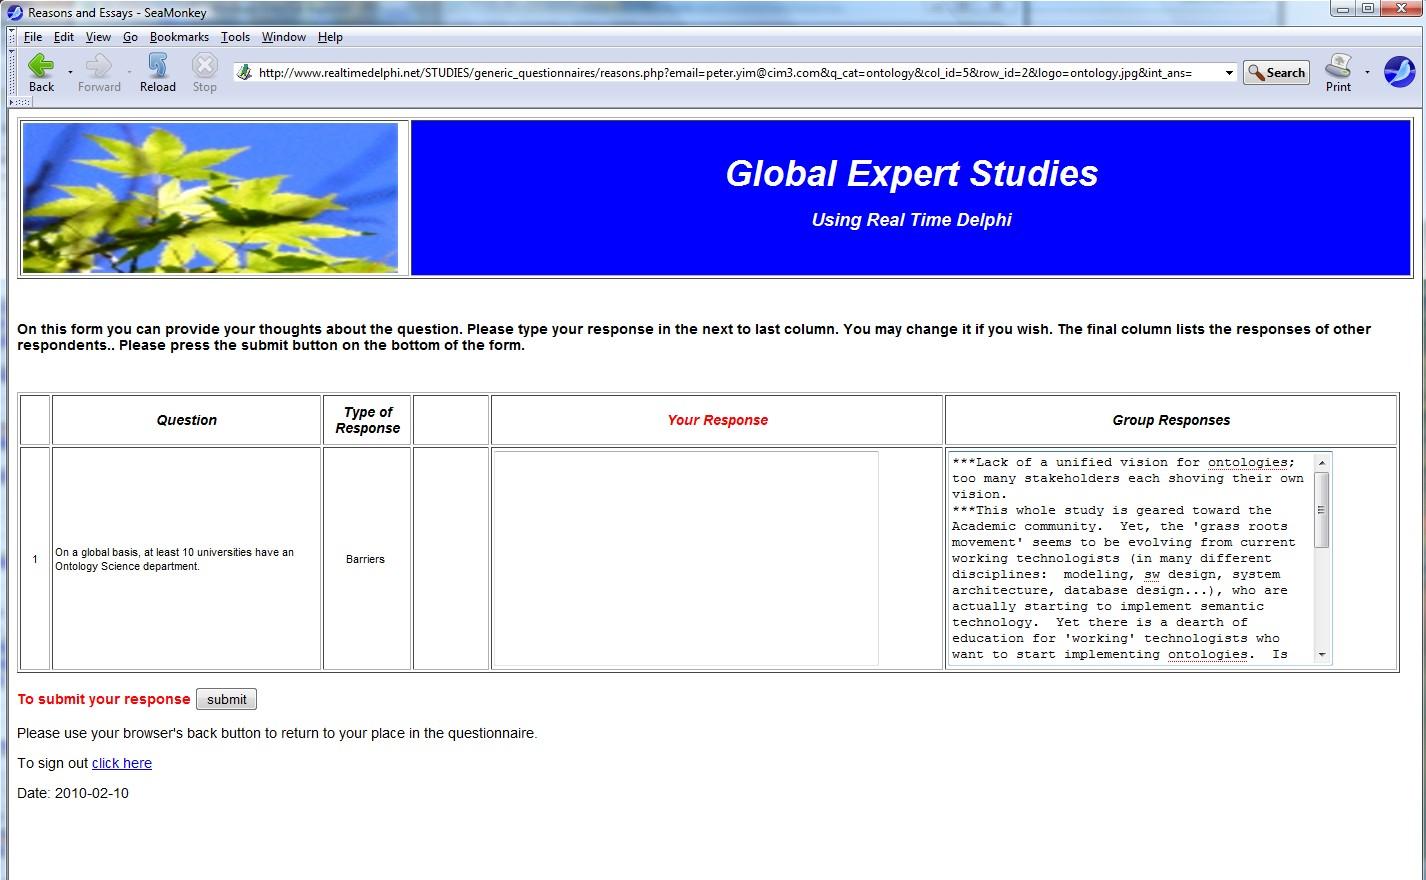 http://ontolog.cim3.net/file/work/OntologySummit2010/studies/RTDelphi-3/screenshot/OntologySummit2010_Survey-3_2-1c.jpg